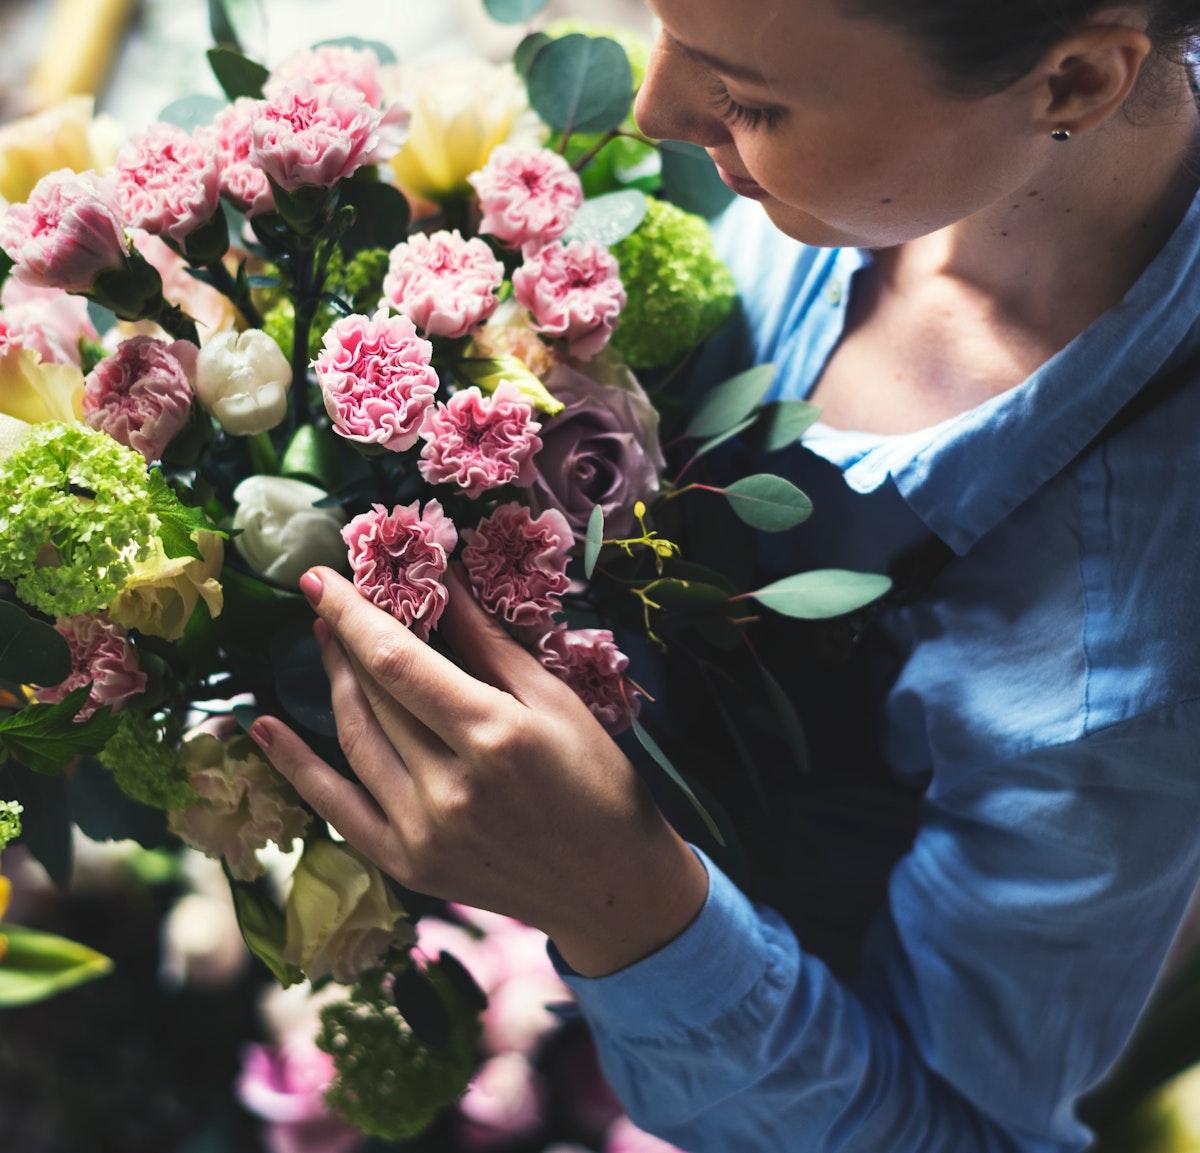 Florist Making Fresh Flowers Bouquet Arrangement